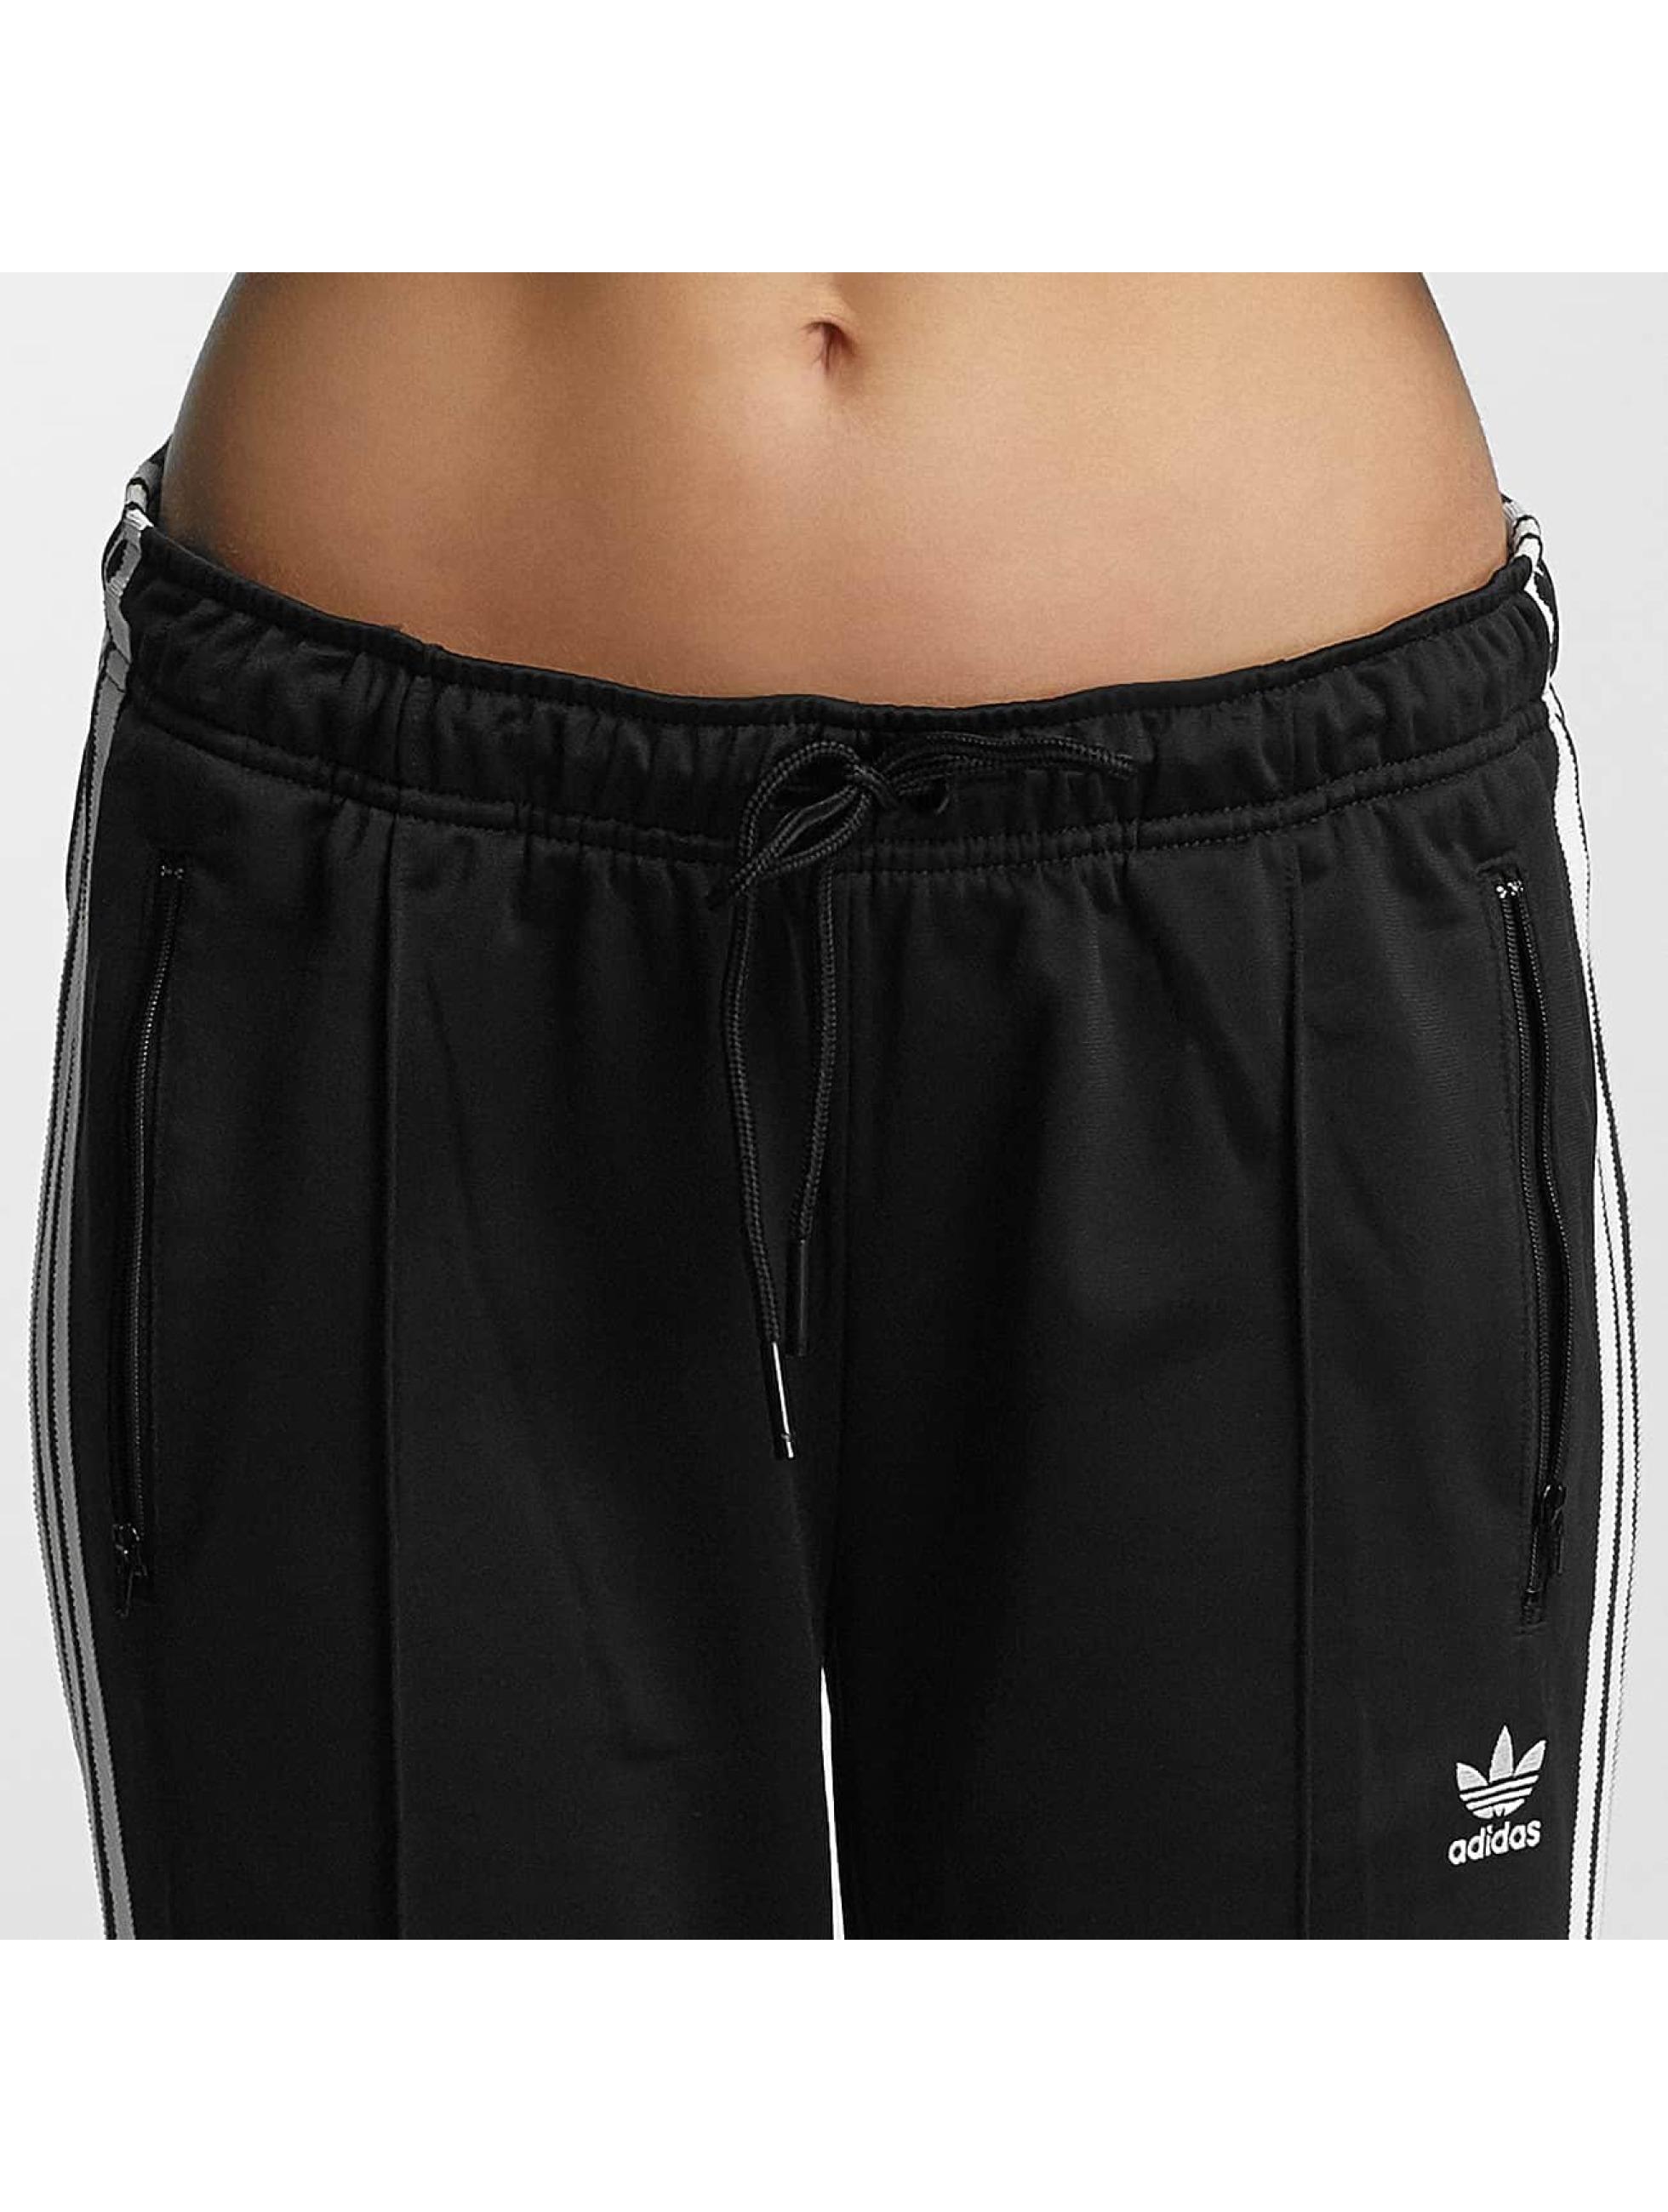 adidas Jogginghose Cigarette schwarz